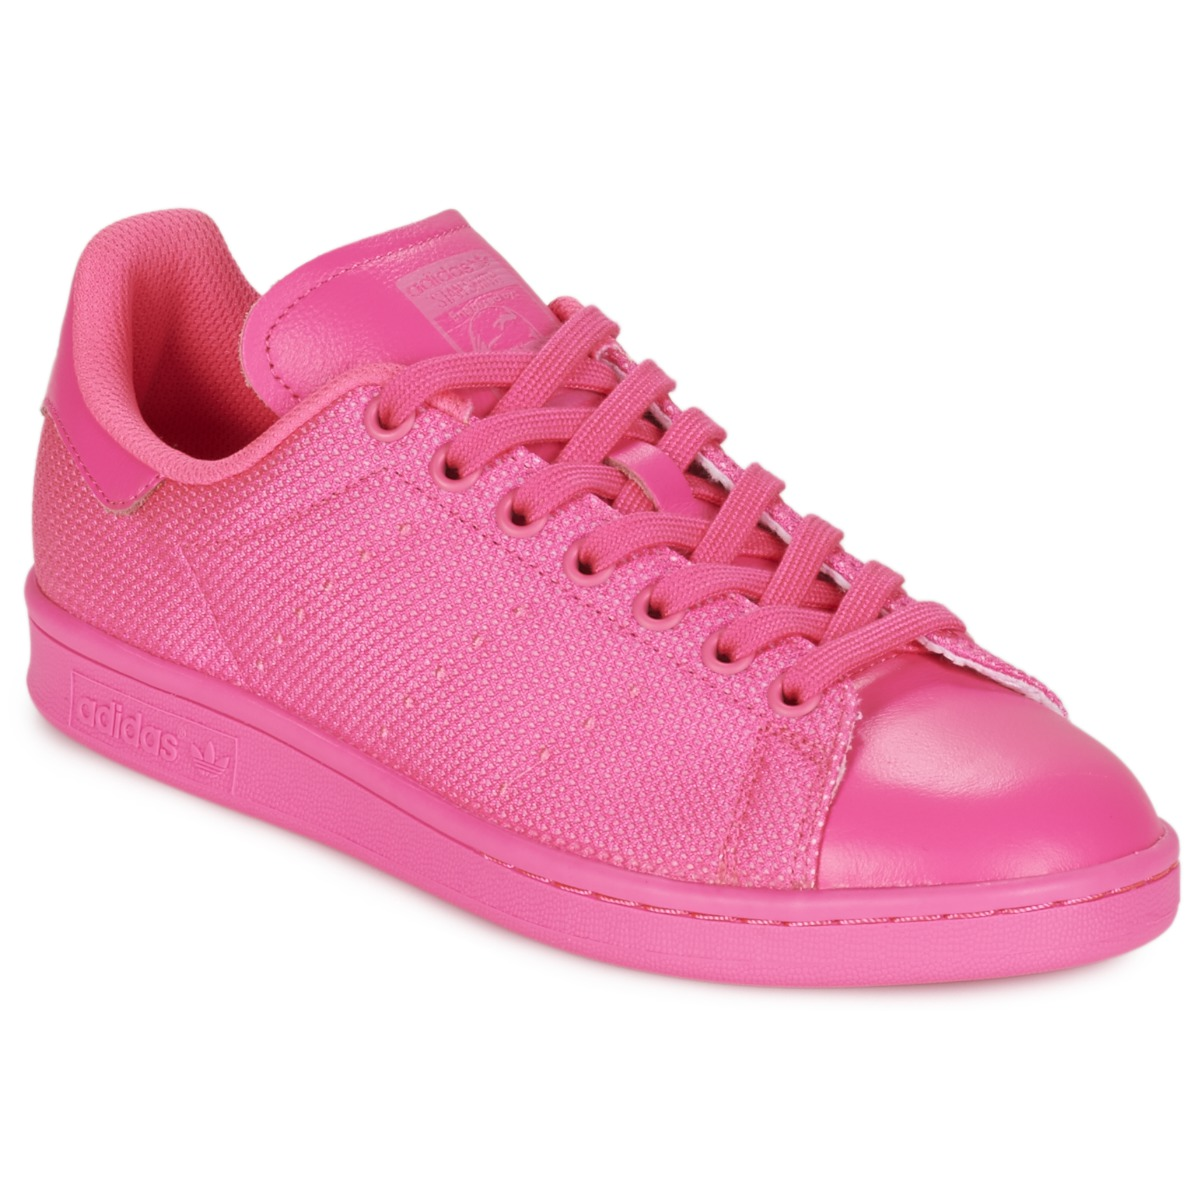 e9e1d830df adidas Originals STAN SMITH Rose - Chaussure pas cher avec Shoes.fr ! -  Chaussures Baskets basses Femme 99,95 €